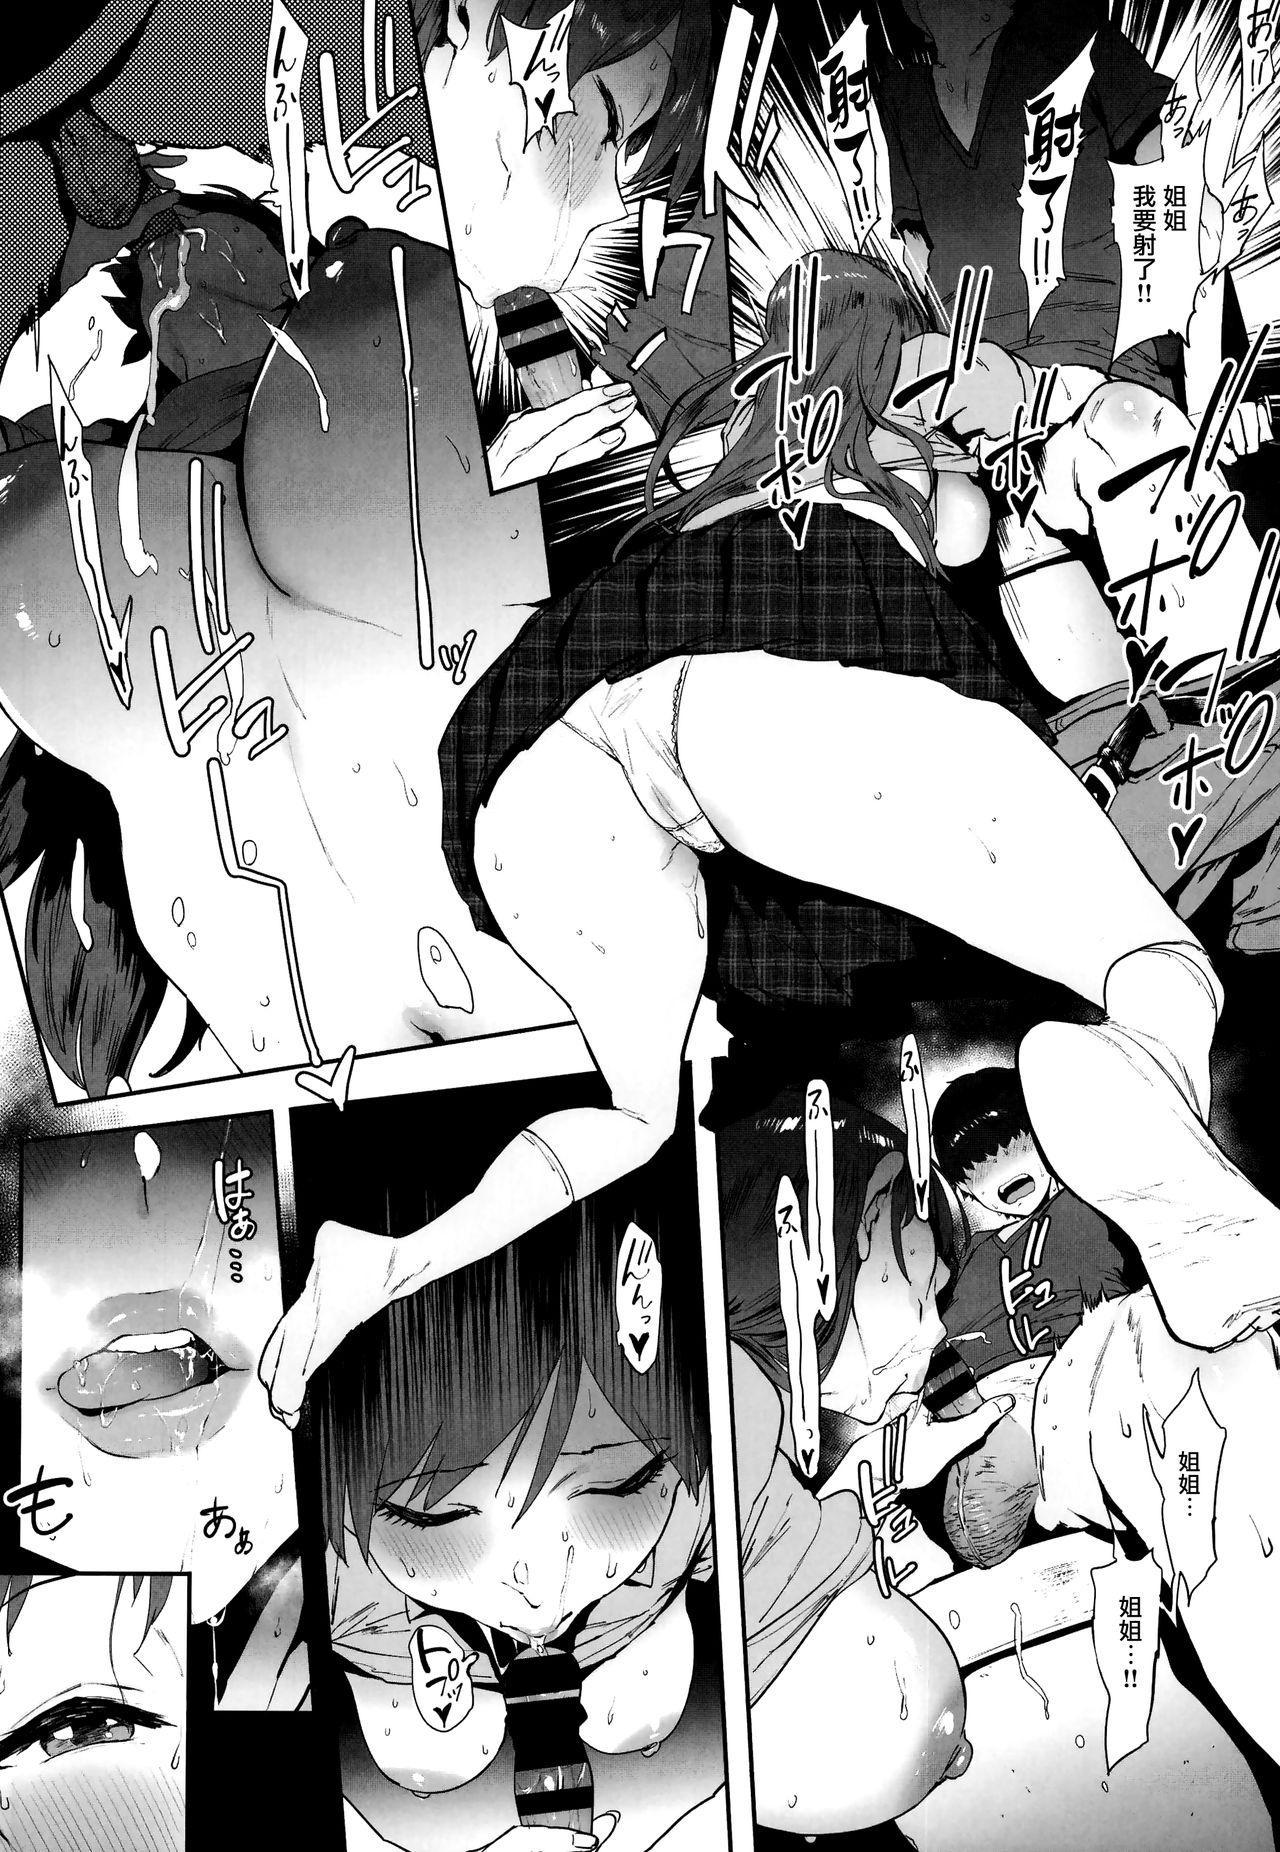 Nitta no Onee-chan 6